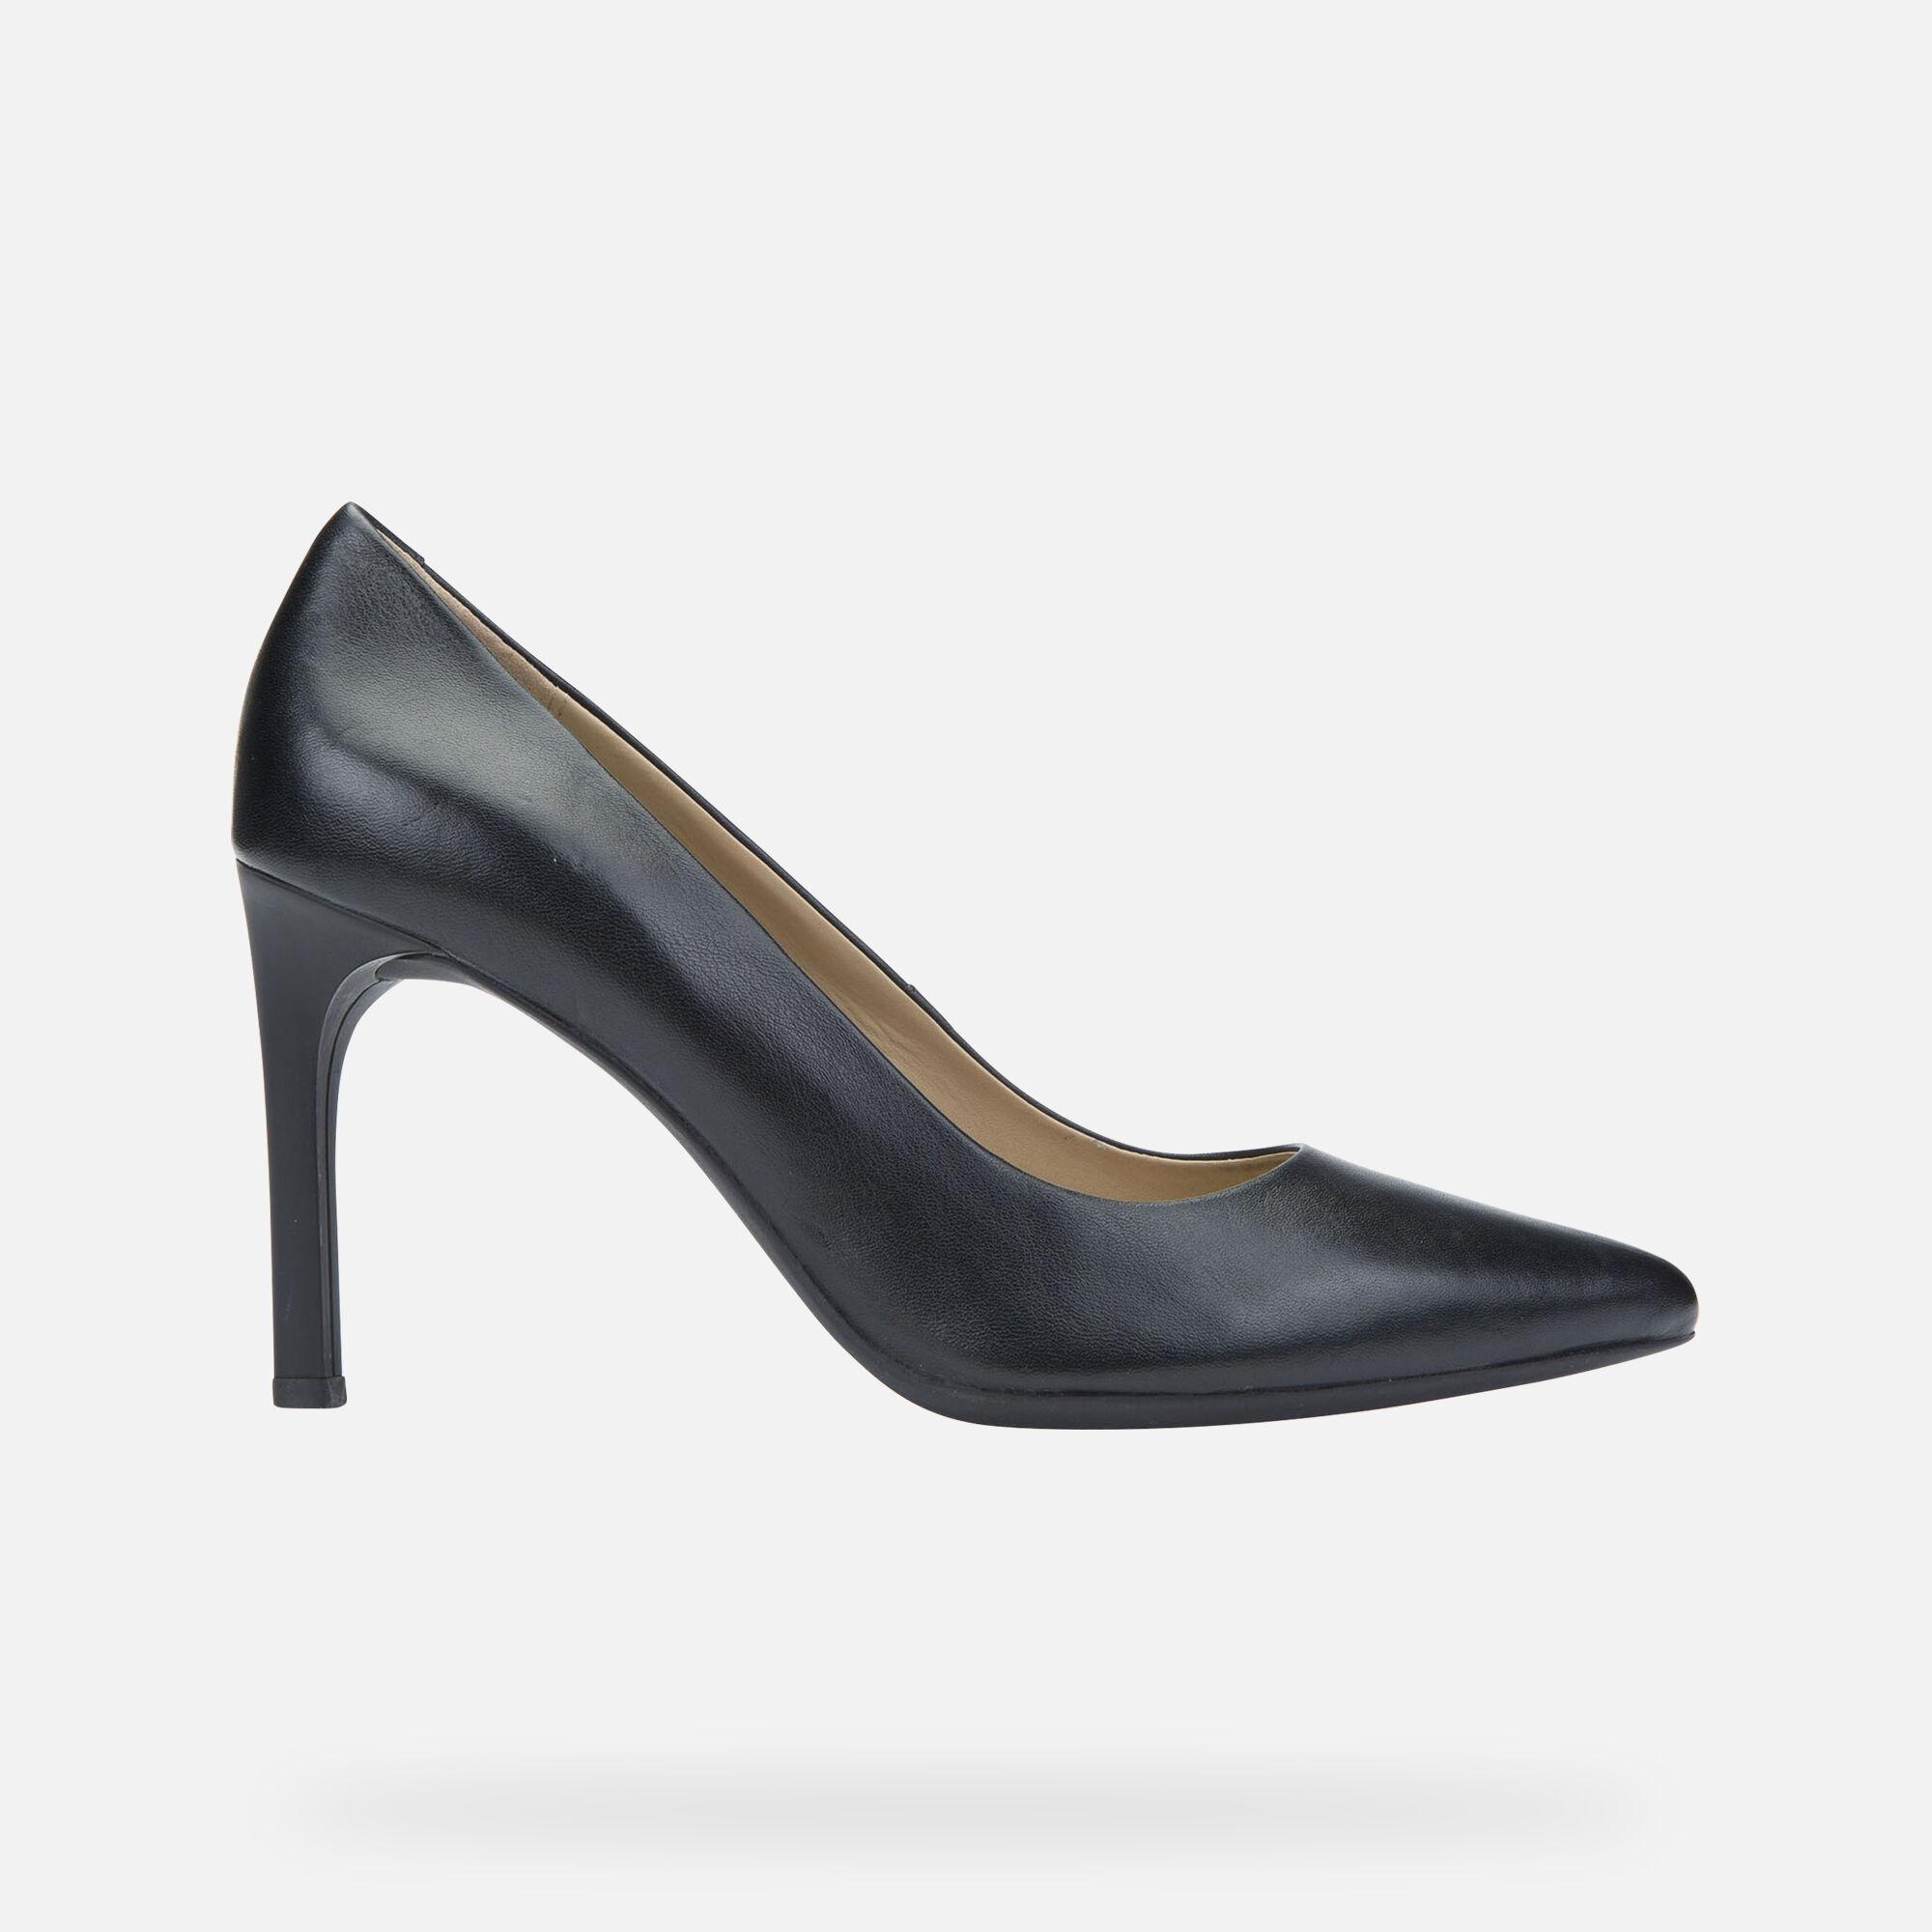 À Chaussures Femme DeGeox Faviola Talons bg6f7y